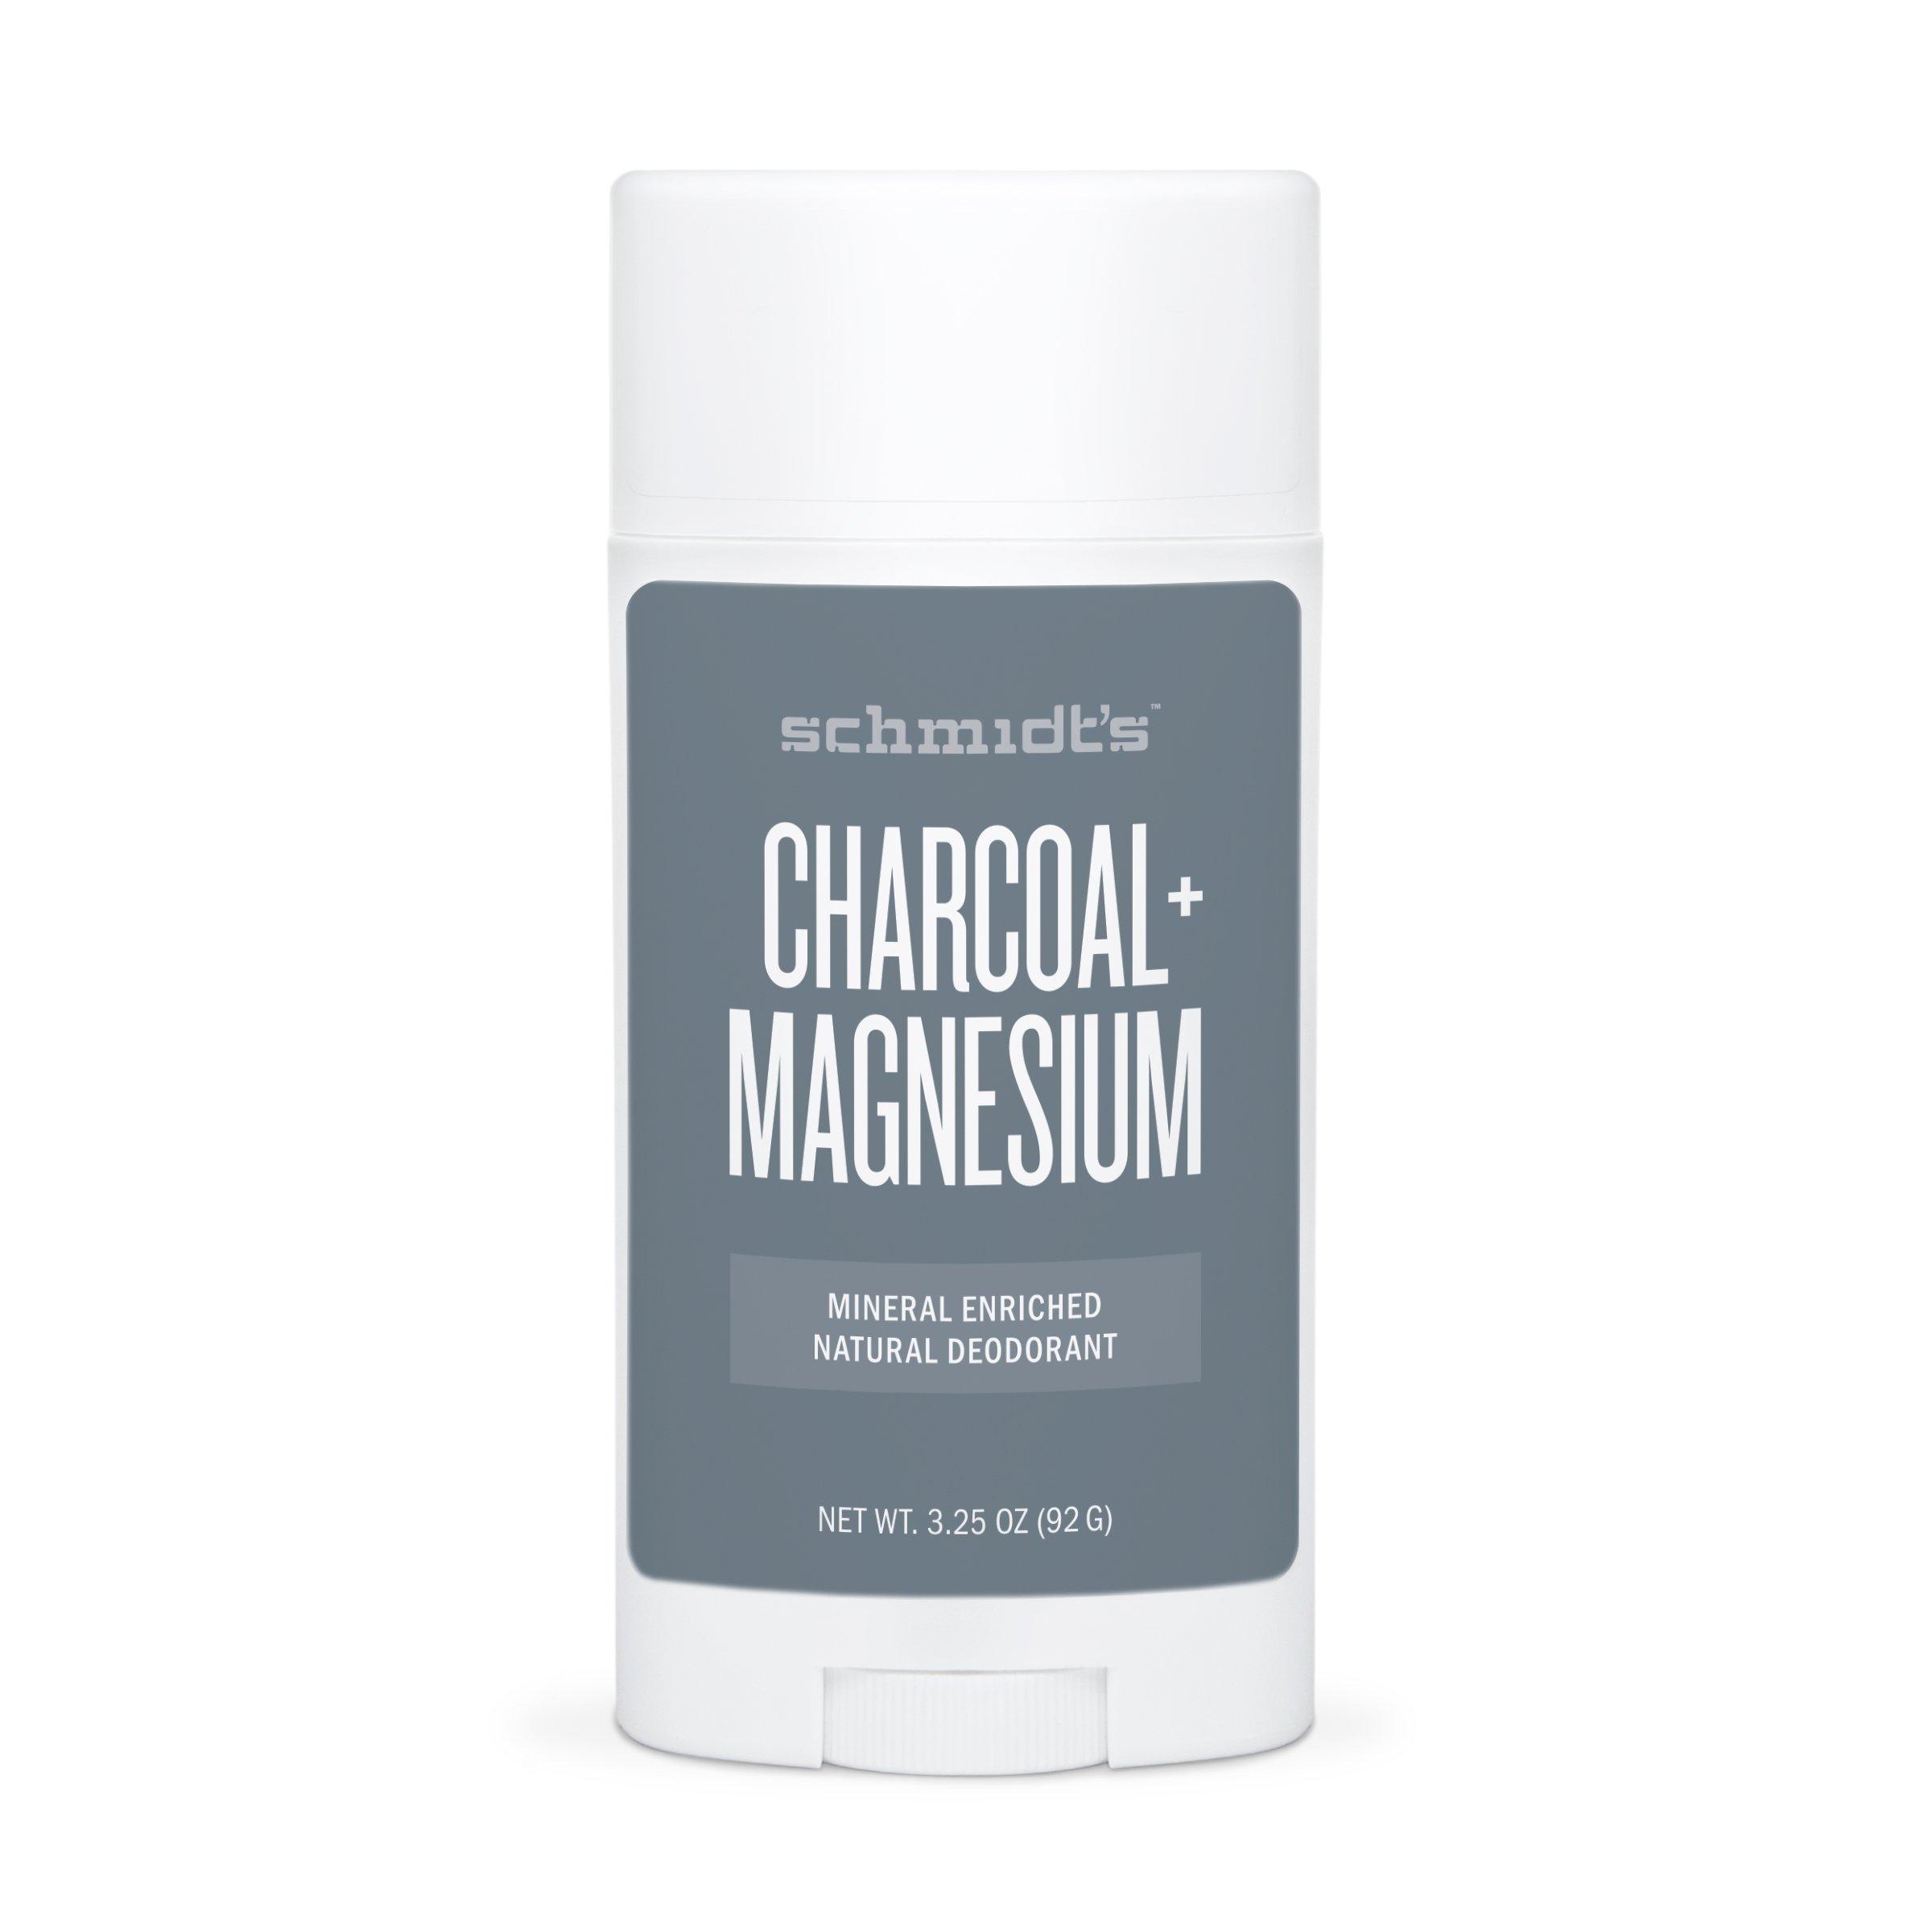 Schmidt's Deodorant Charcoal + Magnesium Deodorant 3.25 oz (92 grams) Stick(S)